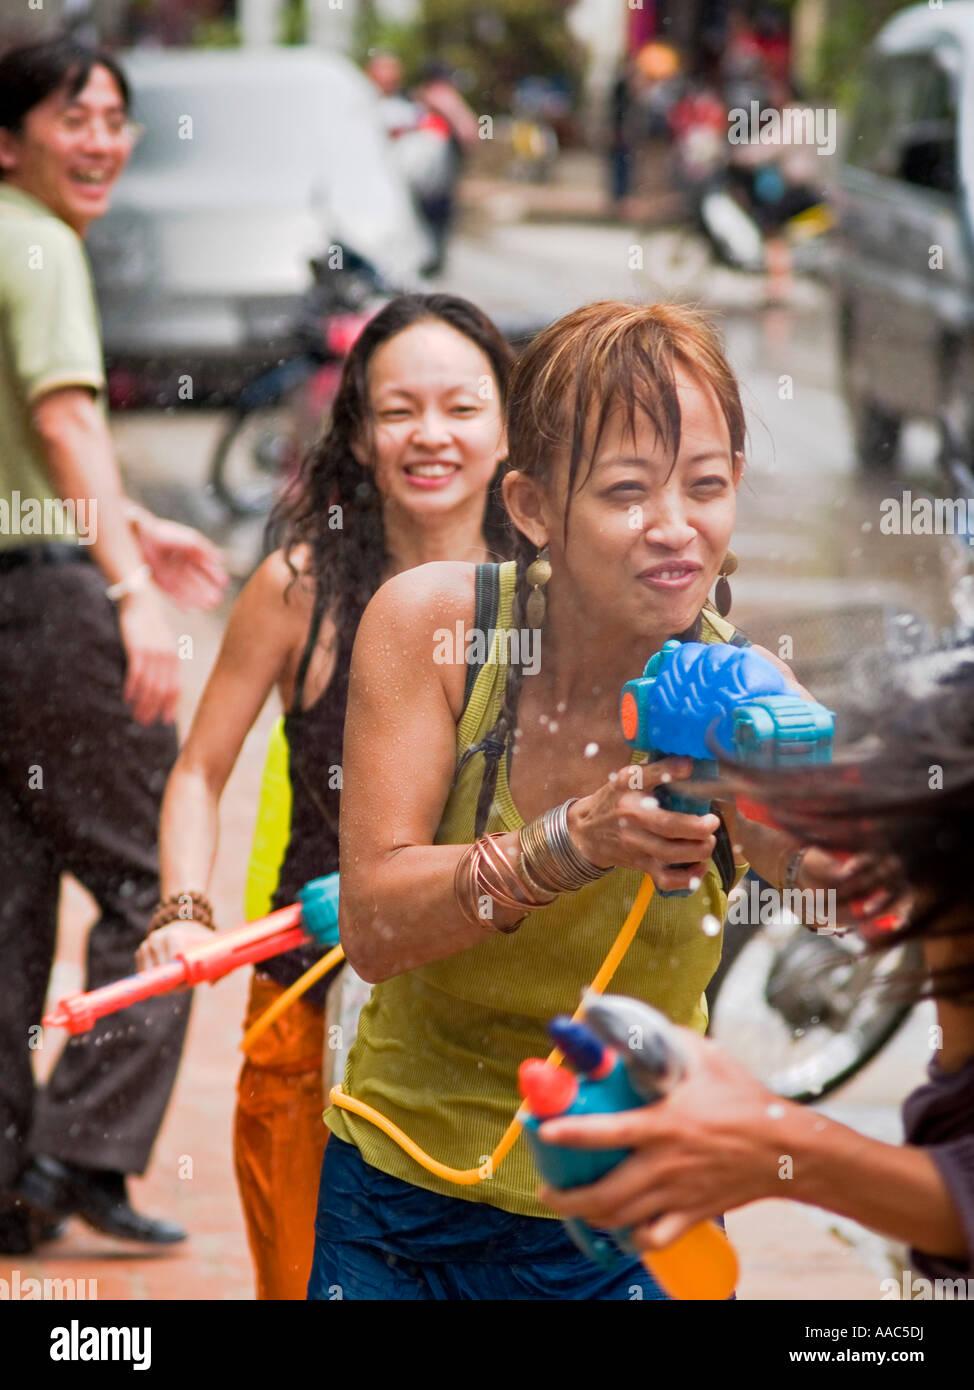 https://c8.alamy.com/compit/aac5dj/le-ragazze-si-bagnano-lao-anno-nuovo-aac5dj.jpg